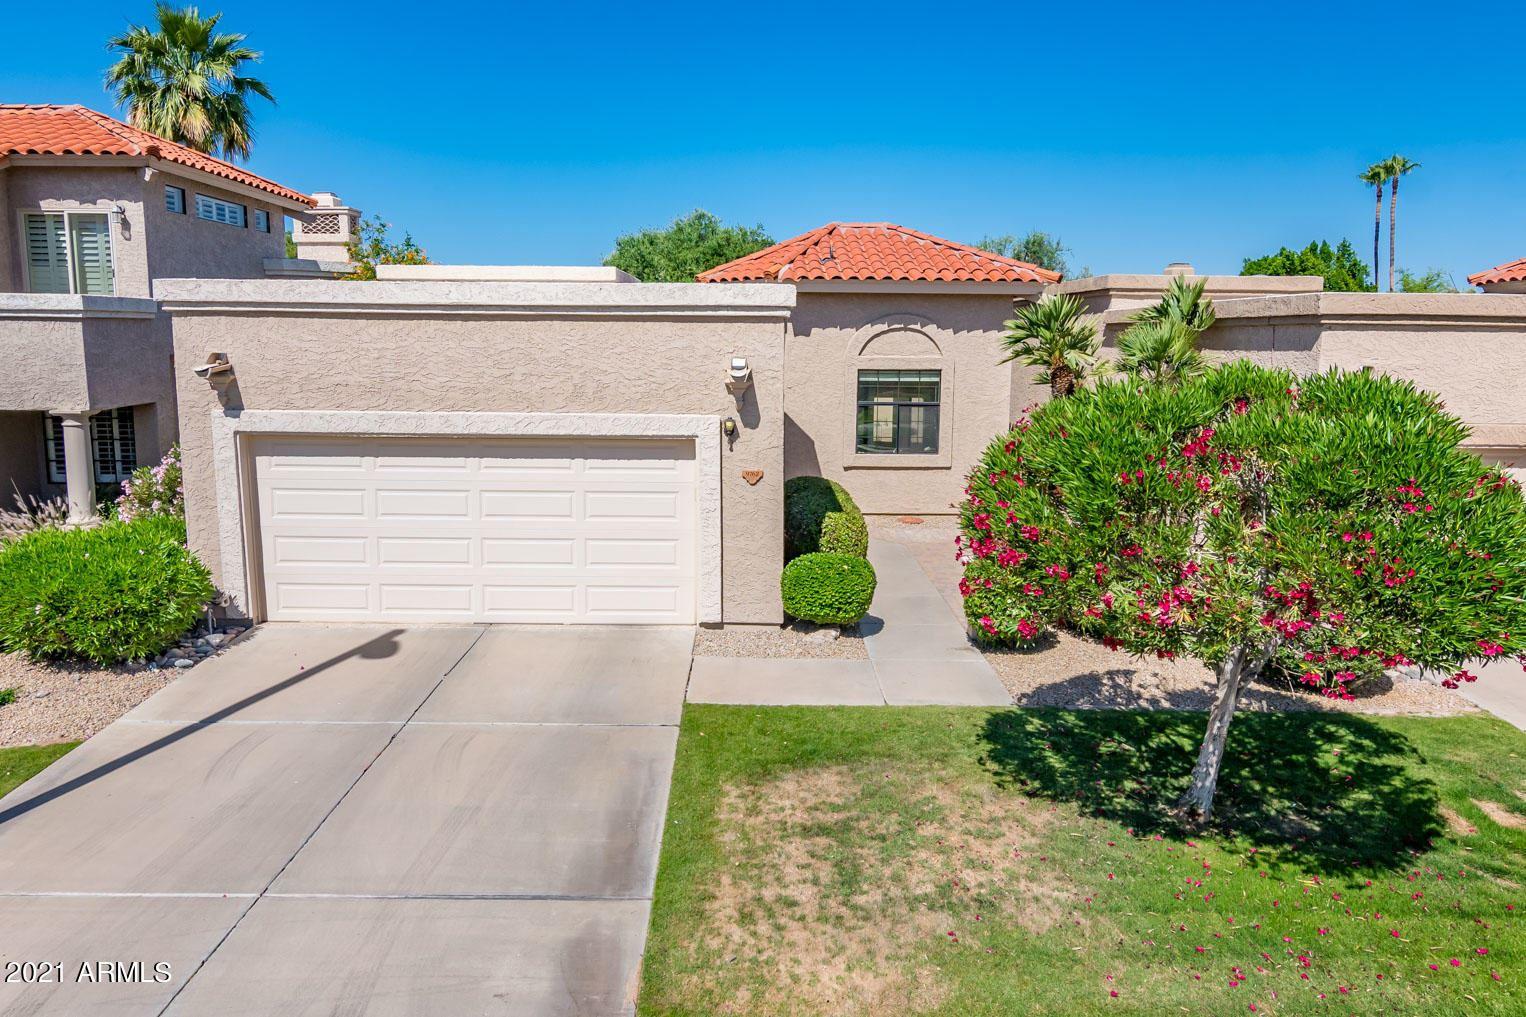 Photo of 9762 N 105TH Place, Scottsdale, AZ 85258 (MLS # 6234455)